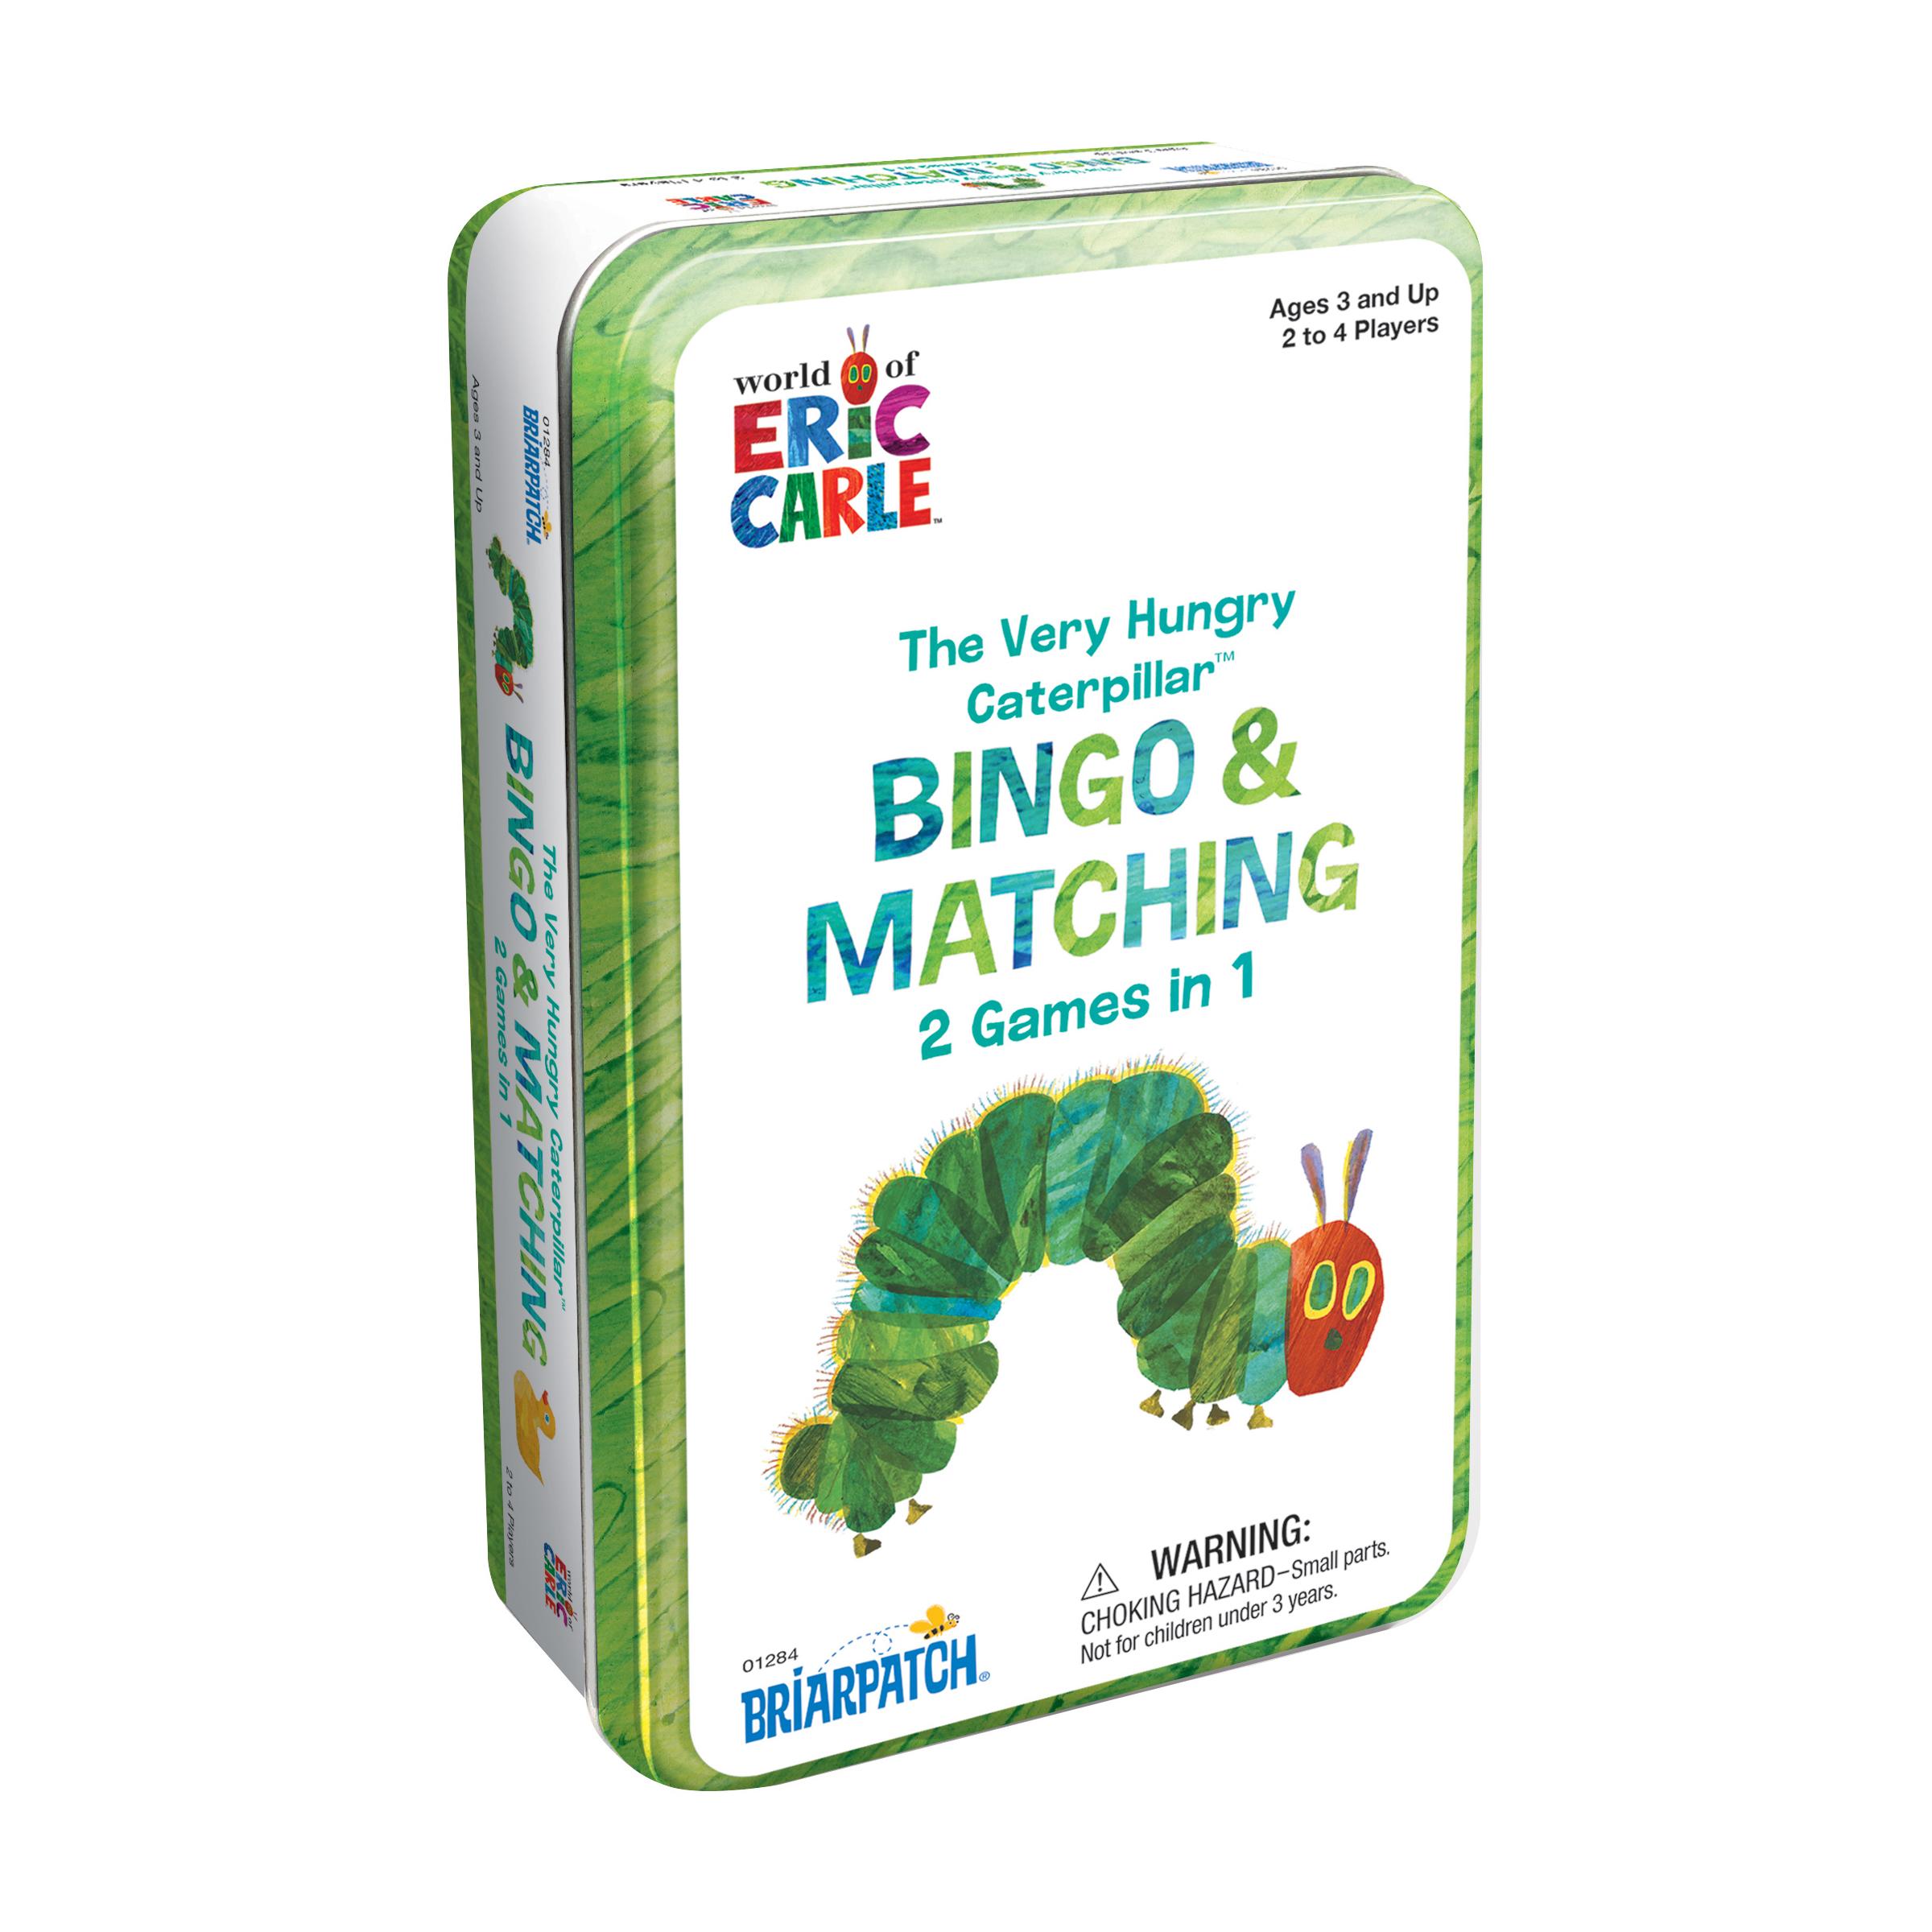 The Very Hungry Caterpillar Bingo & Matching Tin